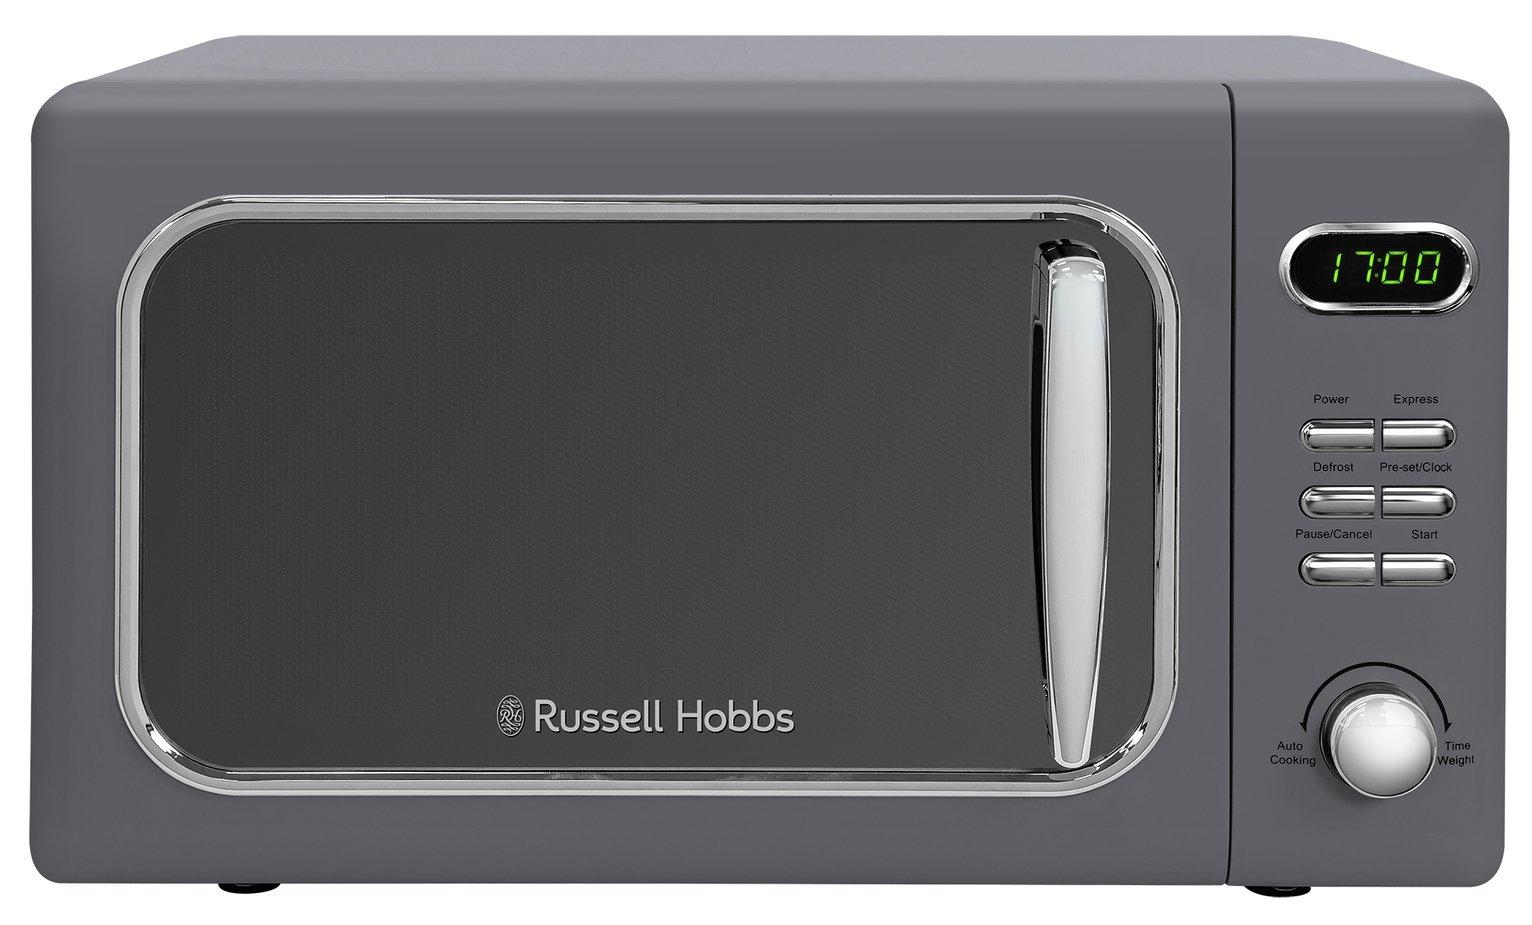 Russell Hobbs 700W Retro Standard Microwave RHMD718G - Grey